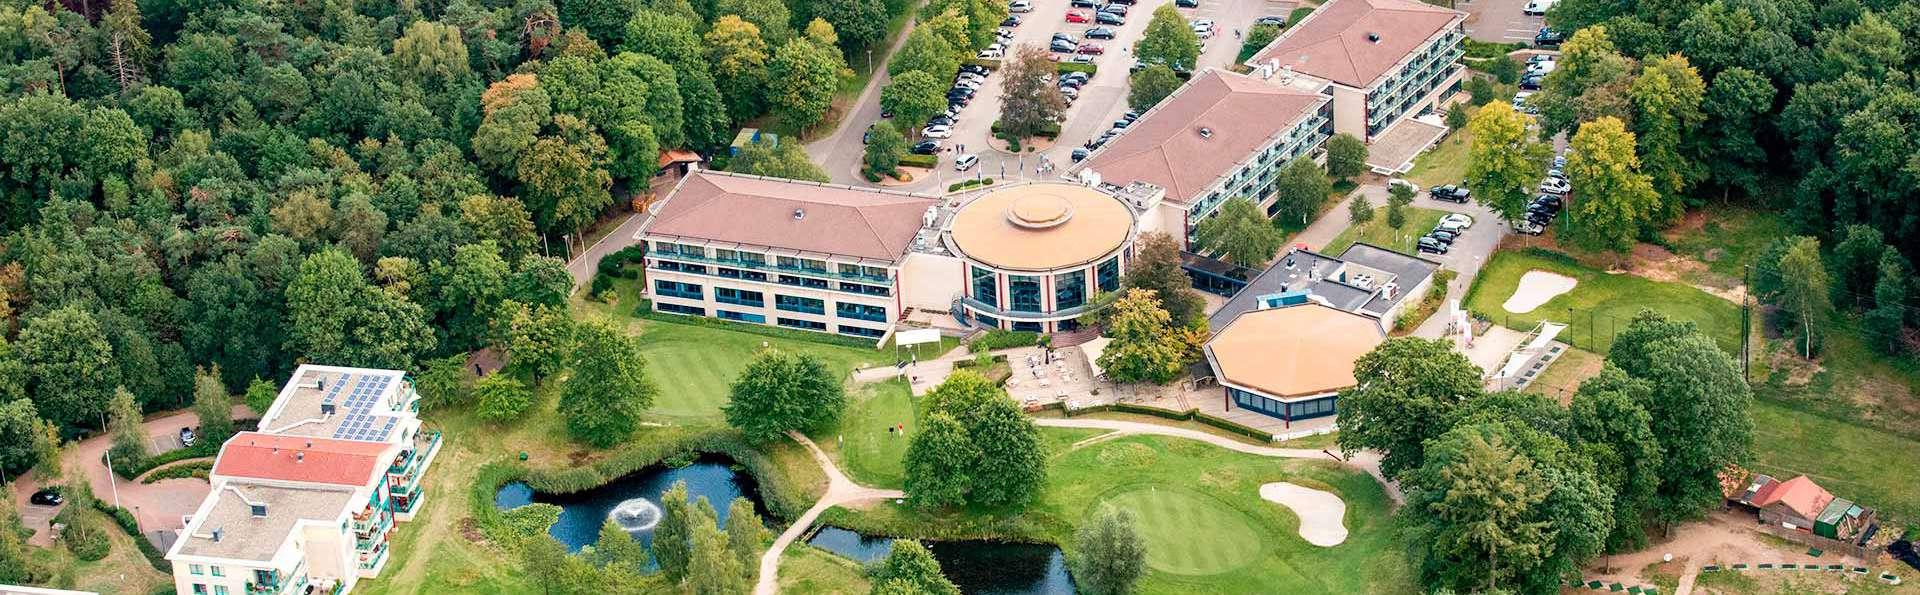 Hilton Royal Parc Soestduinen - EDIT_N2_FRONT_01.jpg